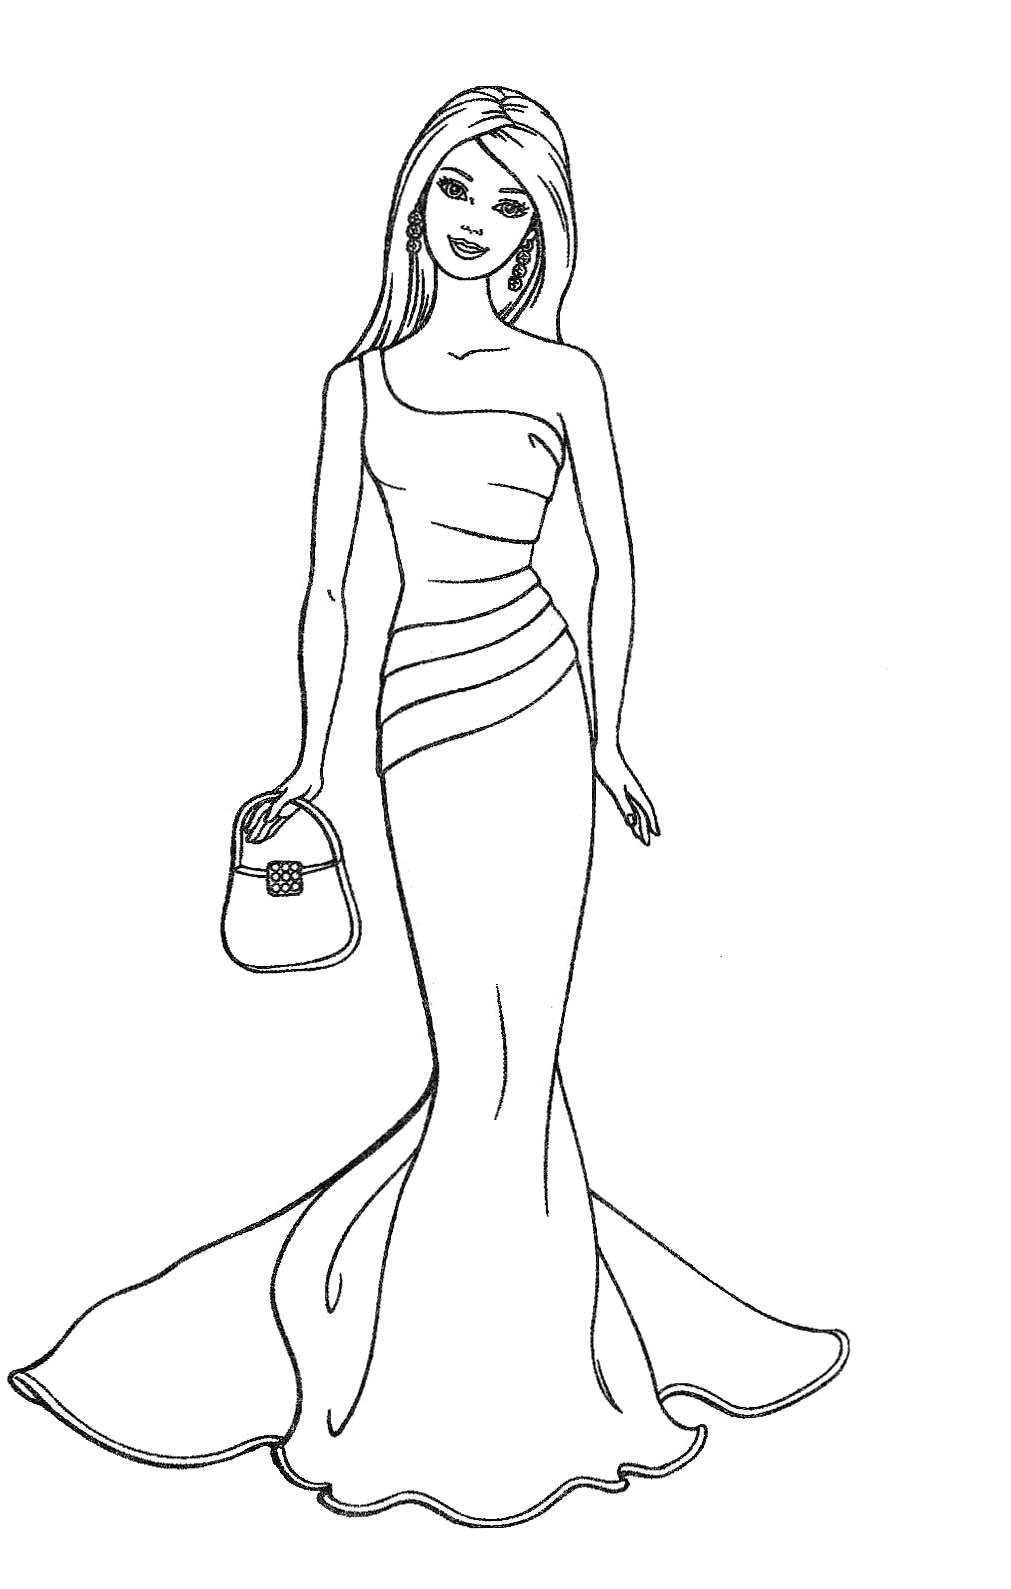 1011x1589 Barbie Doll Cartoon Sketch Photos Beautiful Pencil Sketches